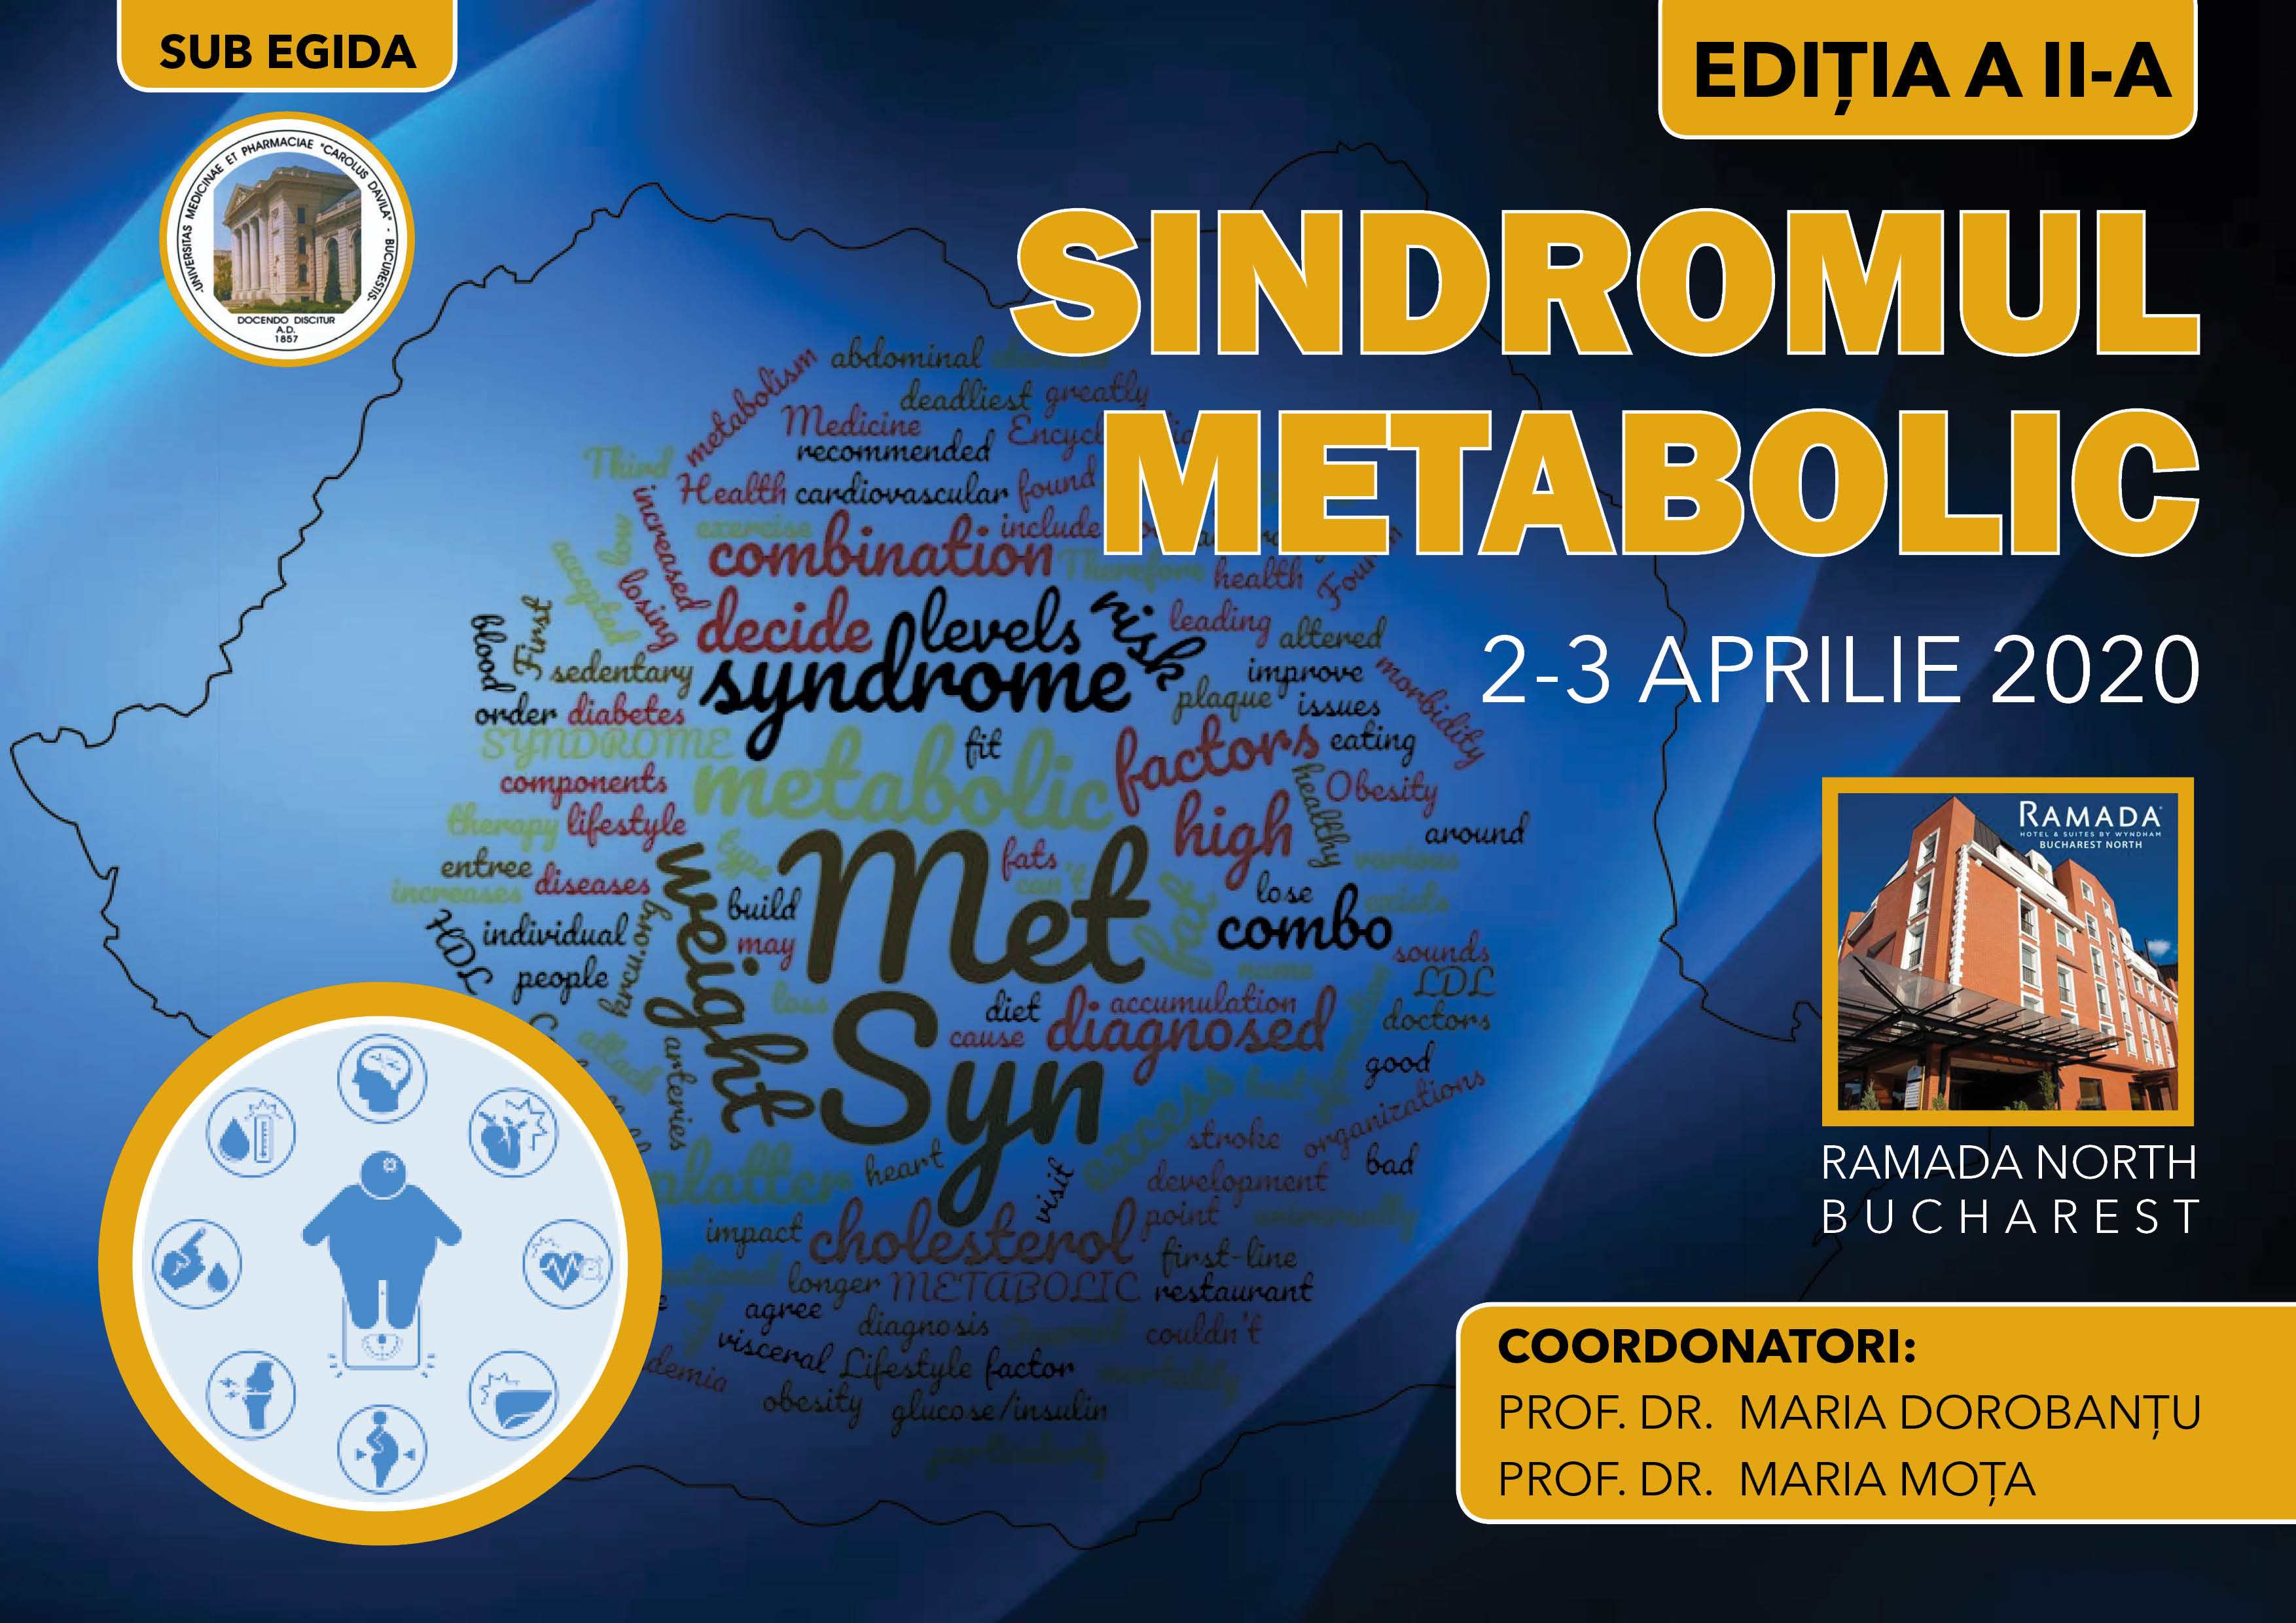 Sindrom metabolic ed 2020